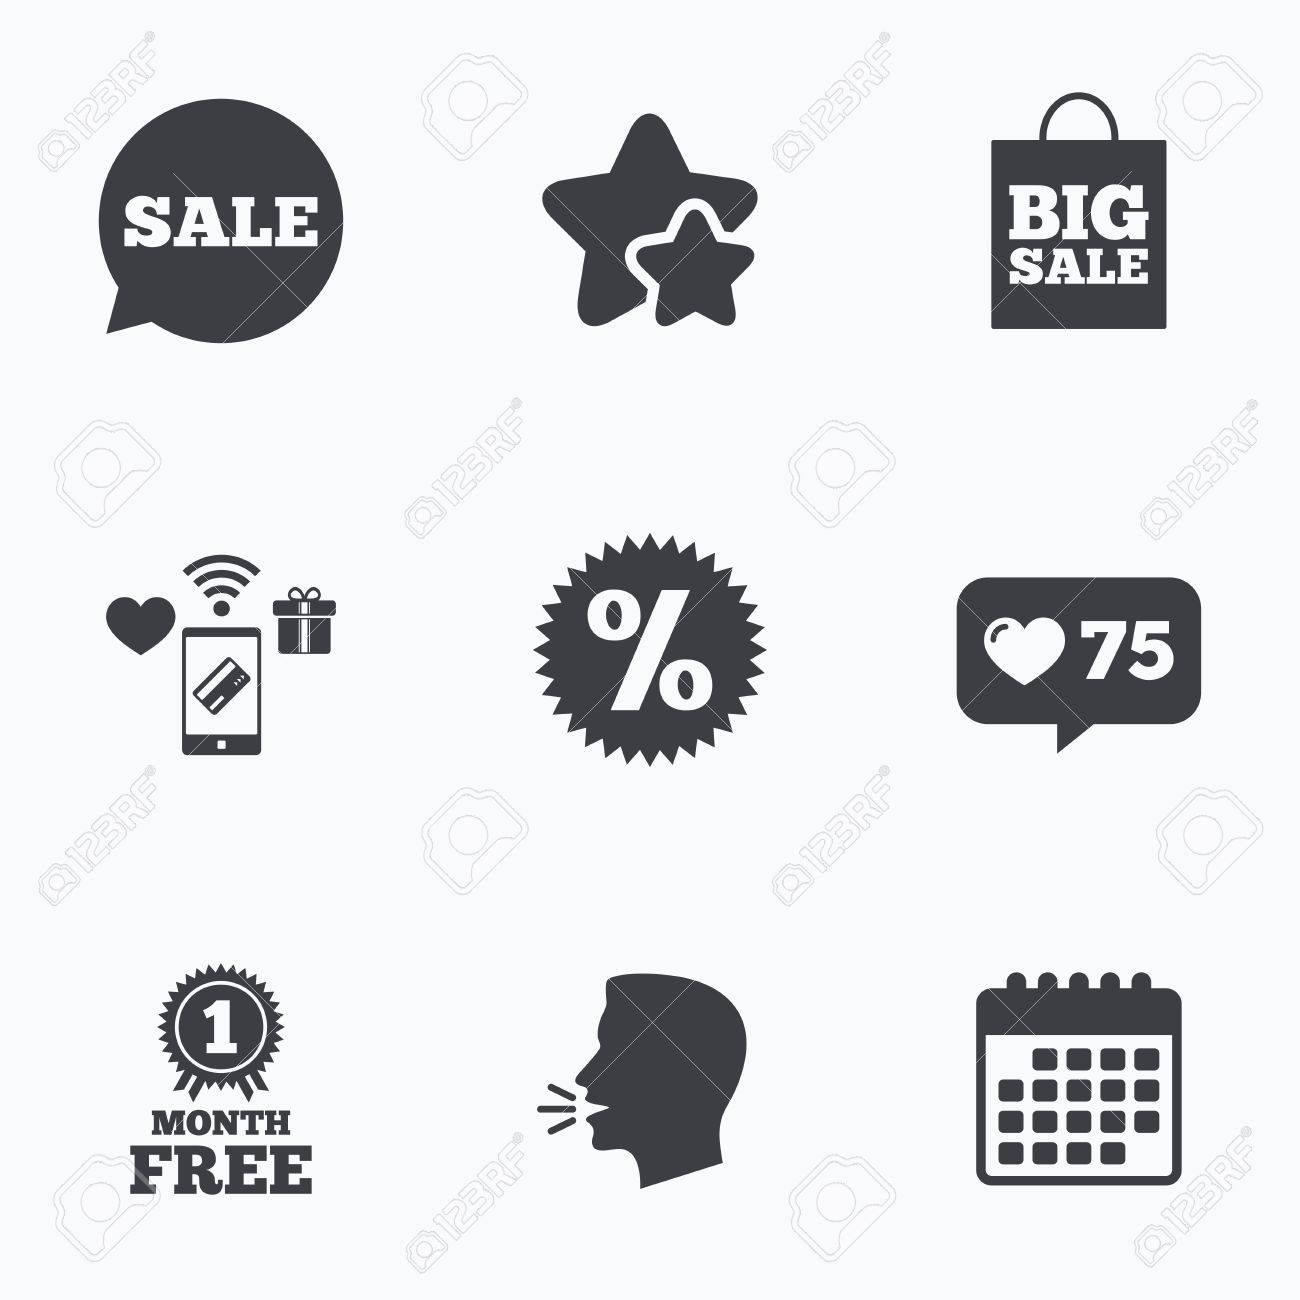 Sale Speech Bubble Icon Discount Star Symbol Big Sale Shopping